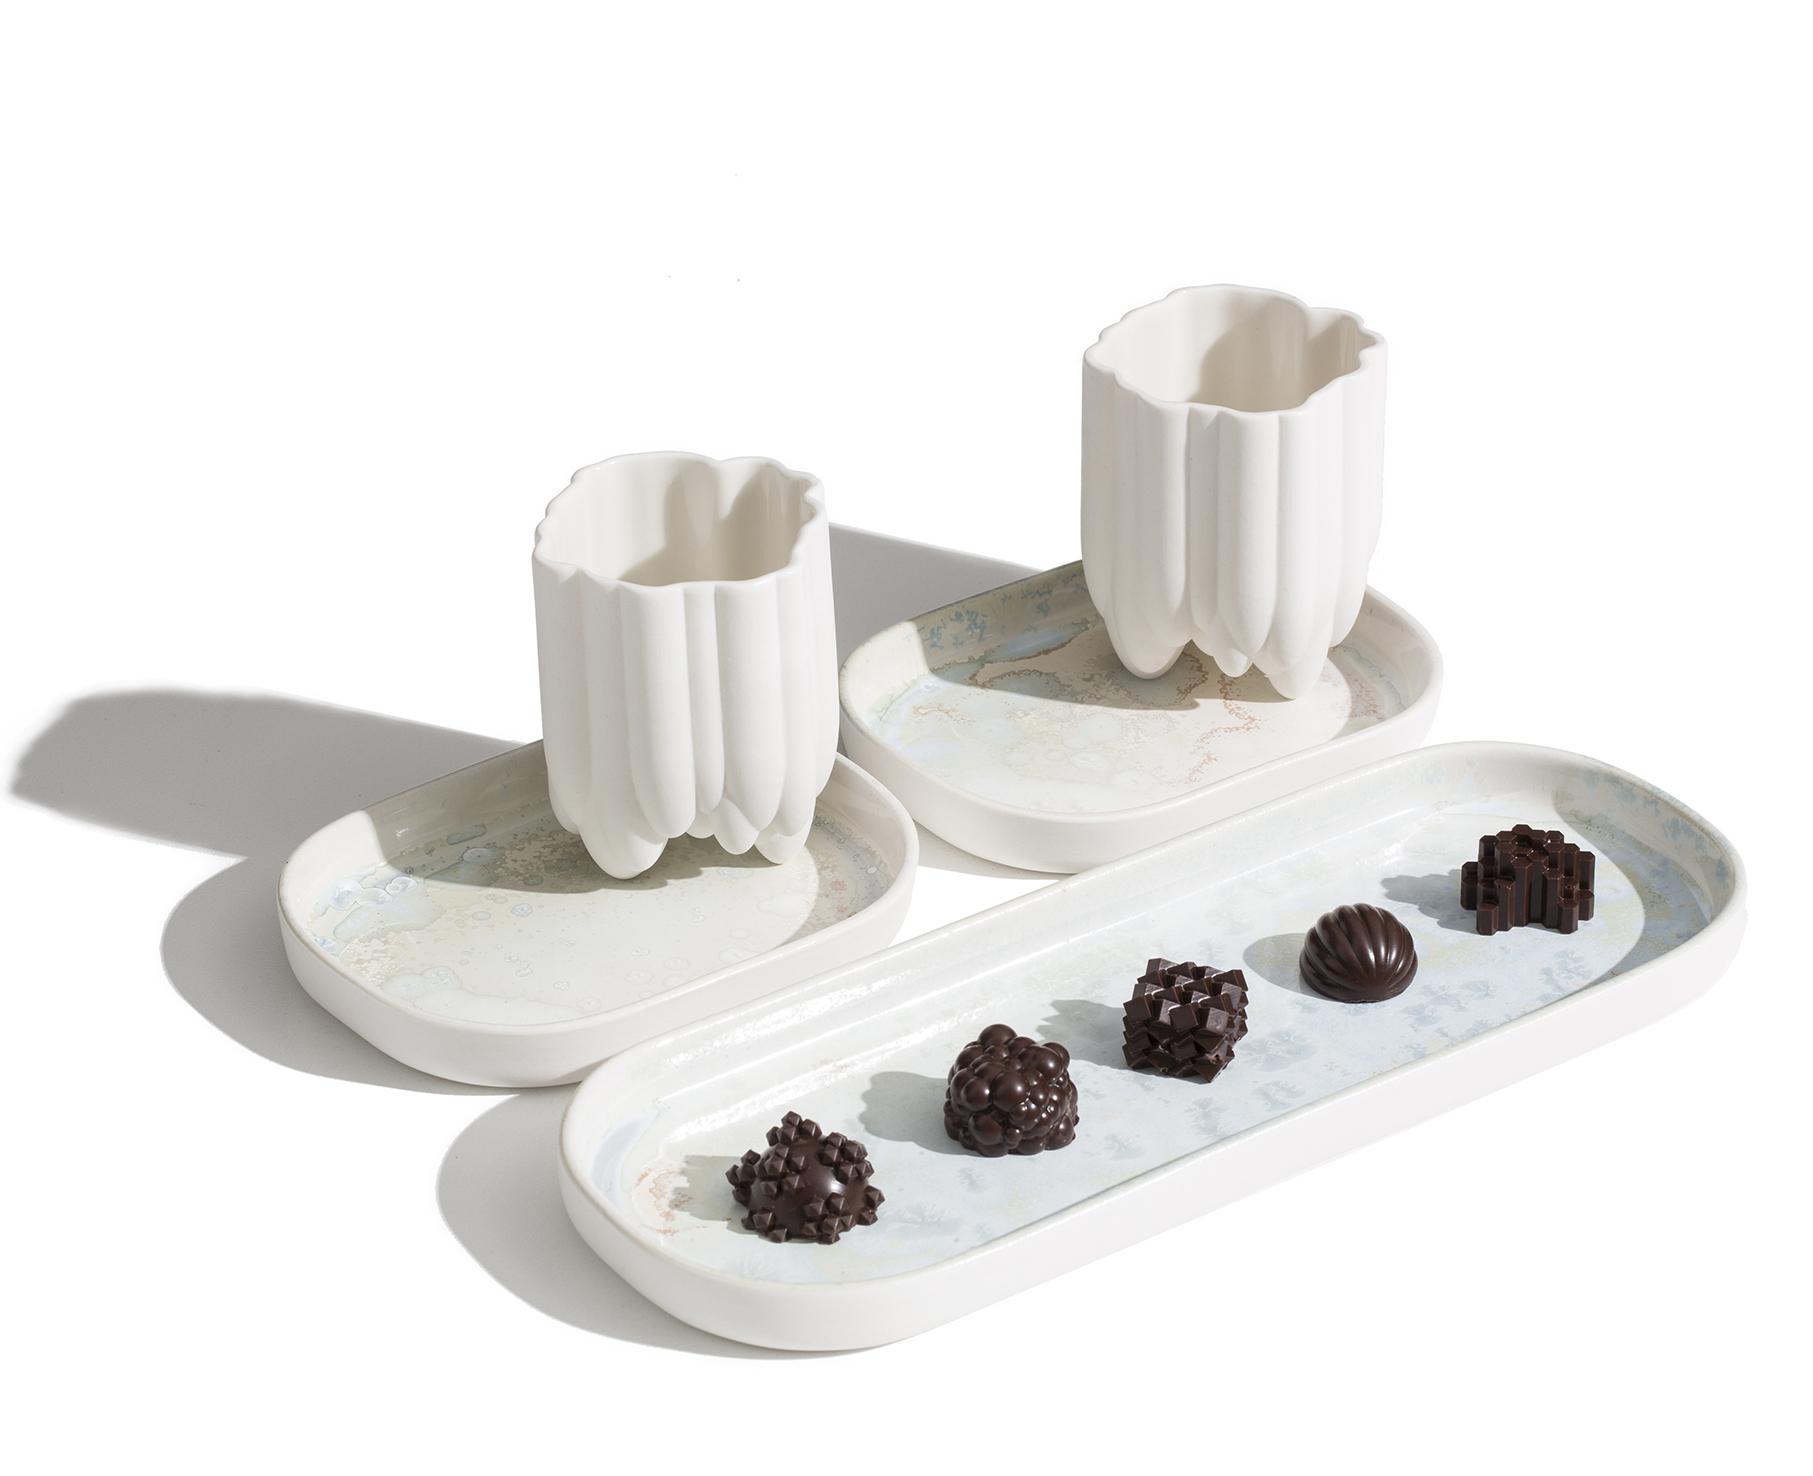 Ceramic set with chocolates